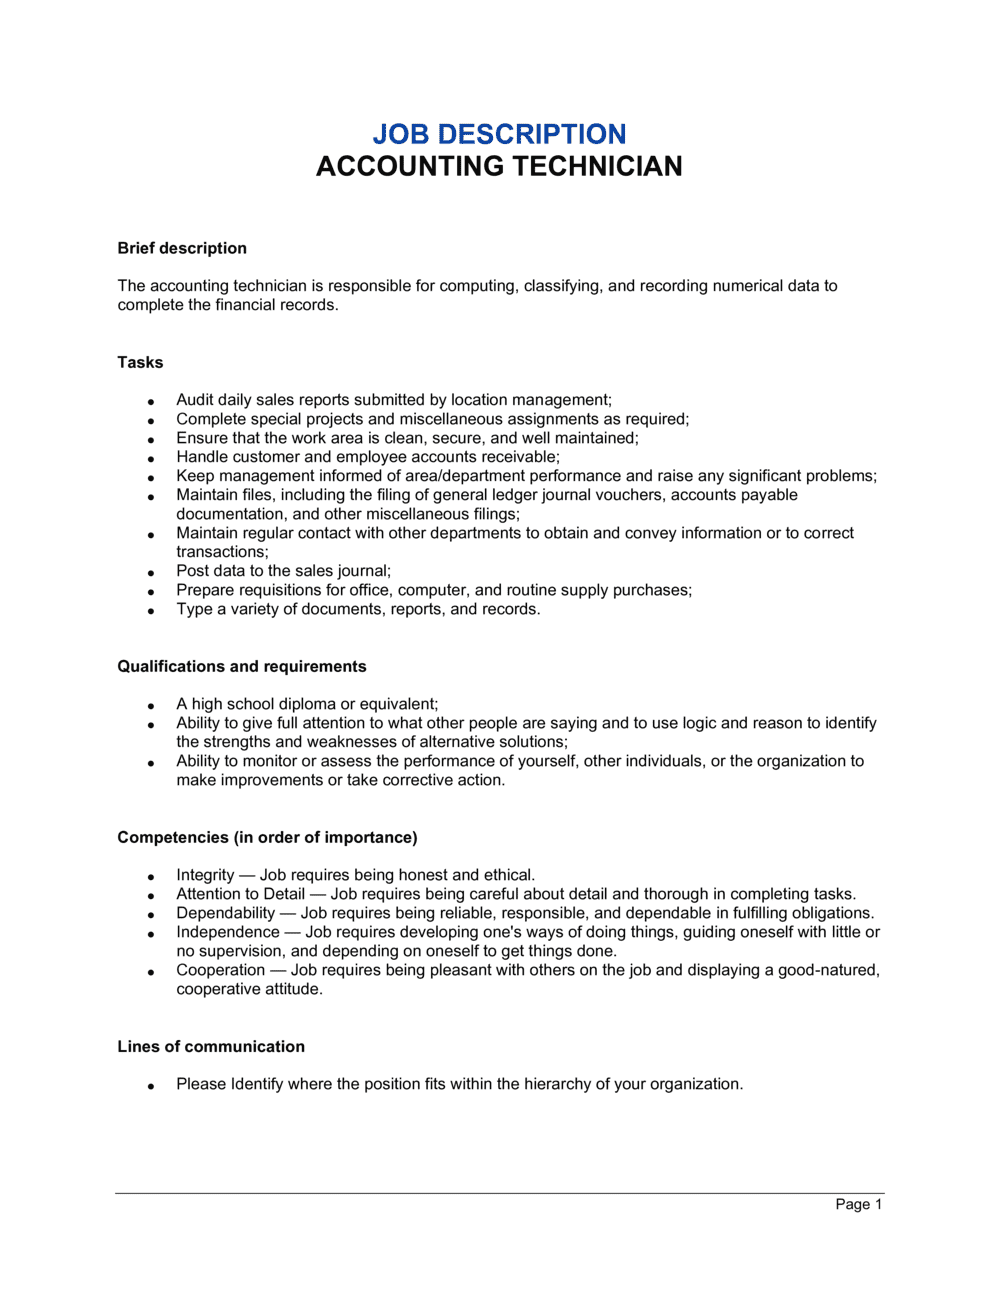 Business-in-a-Box's Accounting Technician Job Description Template